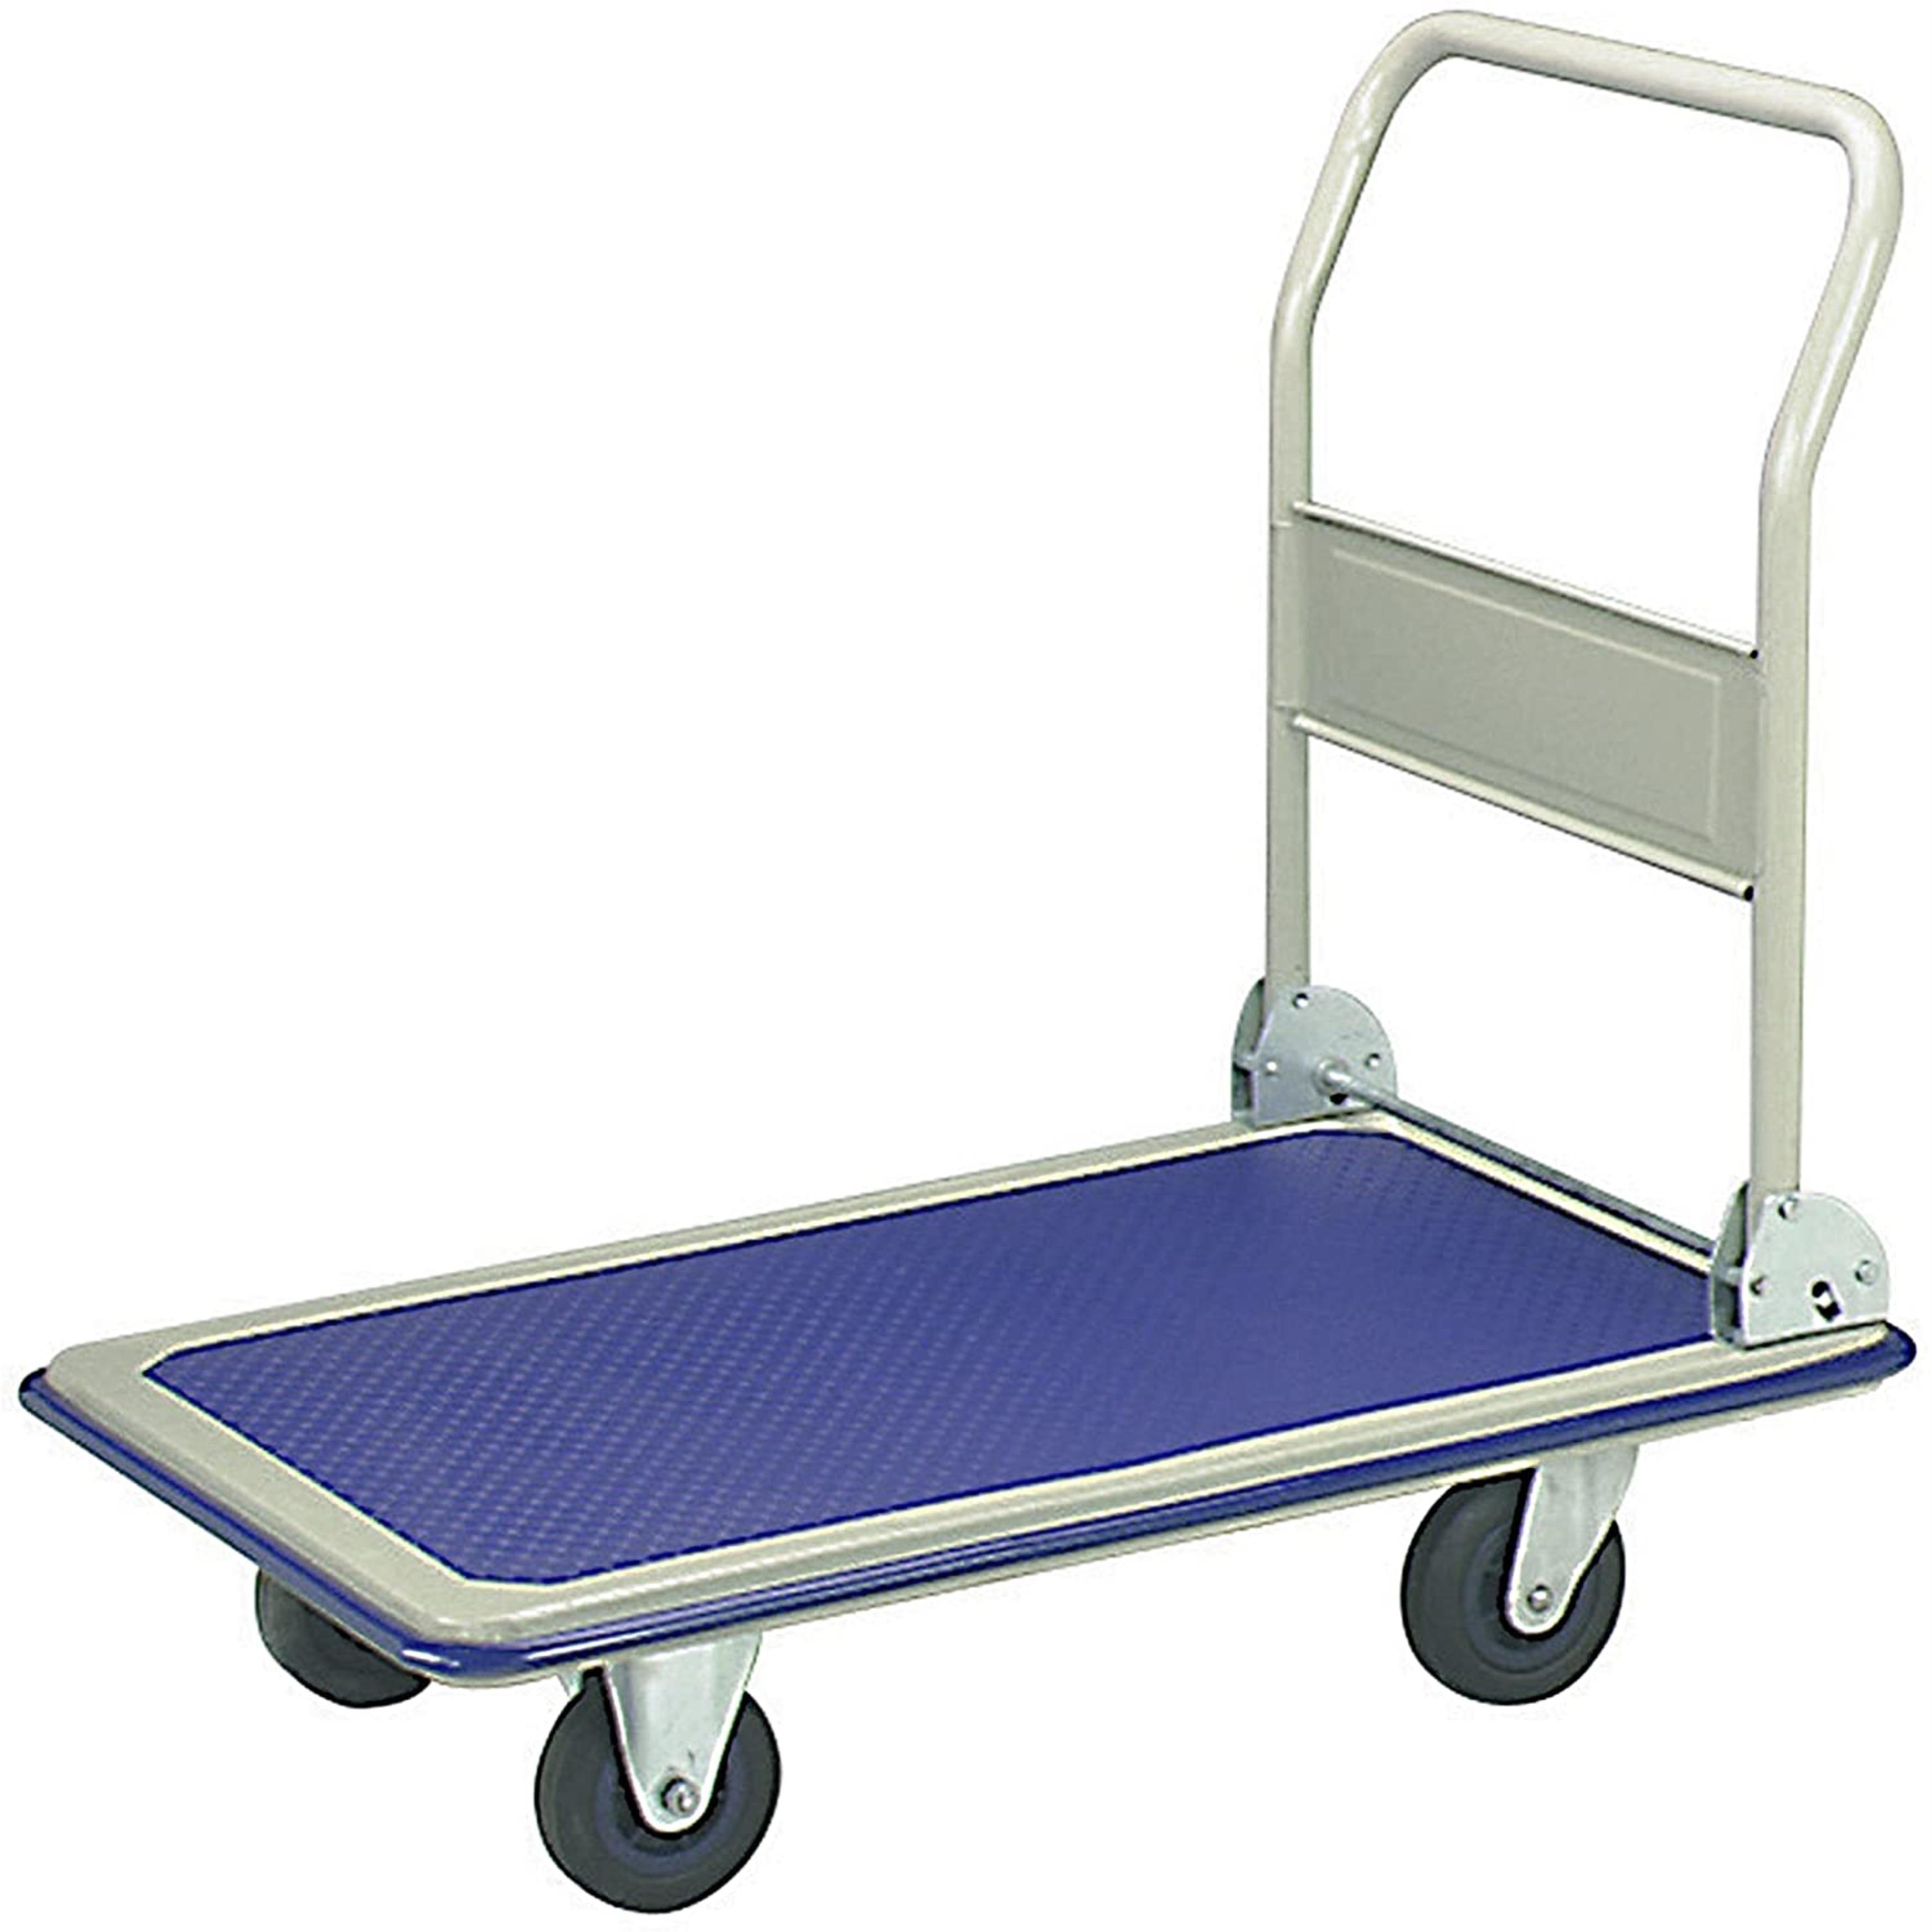 Shop Black Friday Deals On Aleko Push Hand Truck Folding Platform Cart 4 Wheel Dolly Overstock 20699172